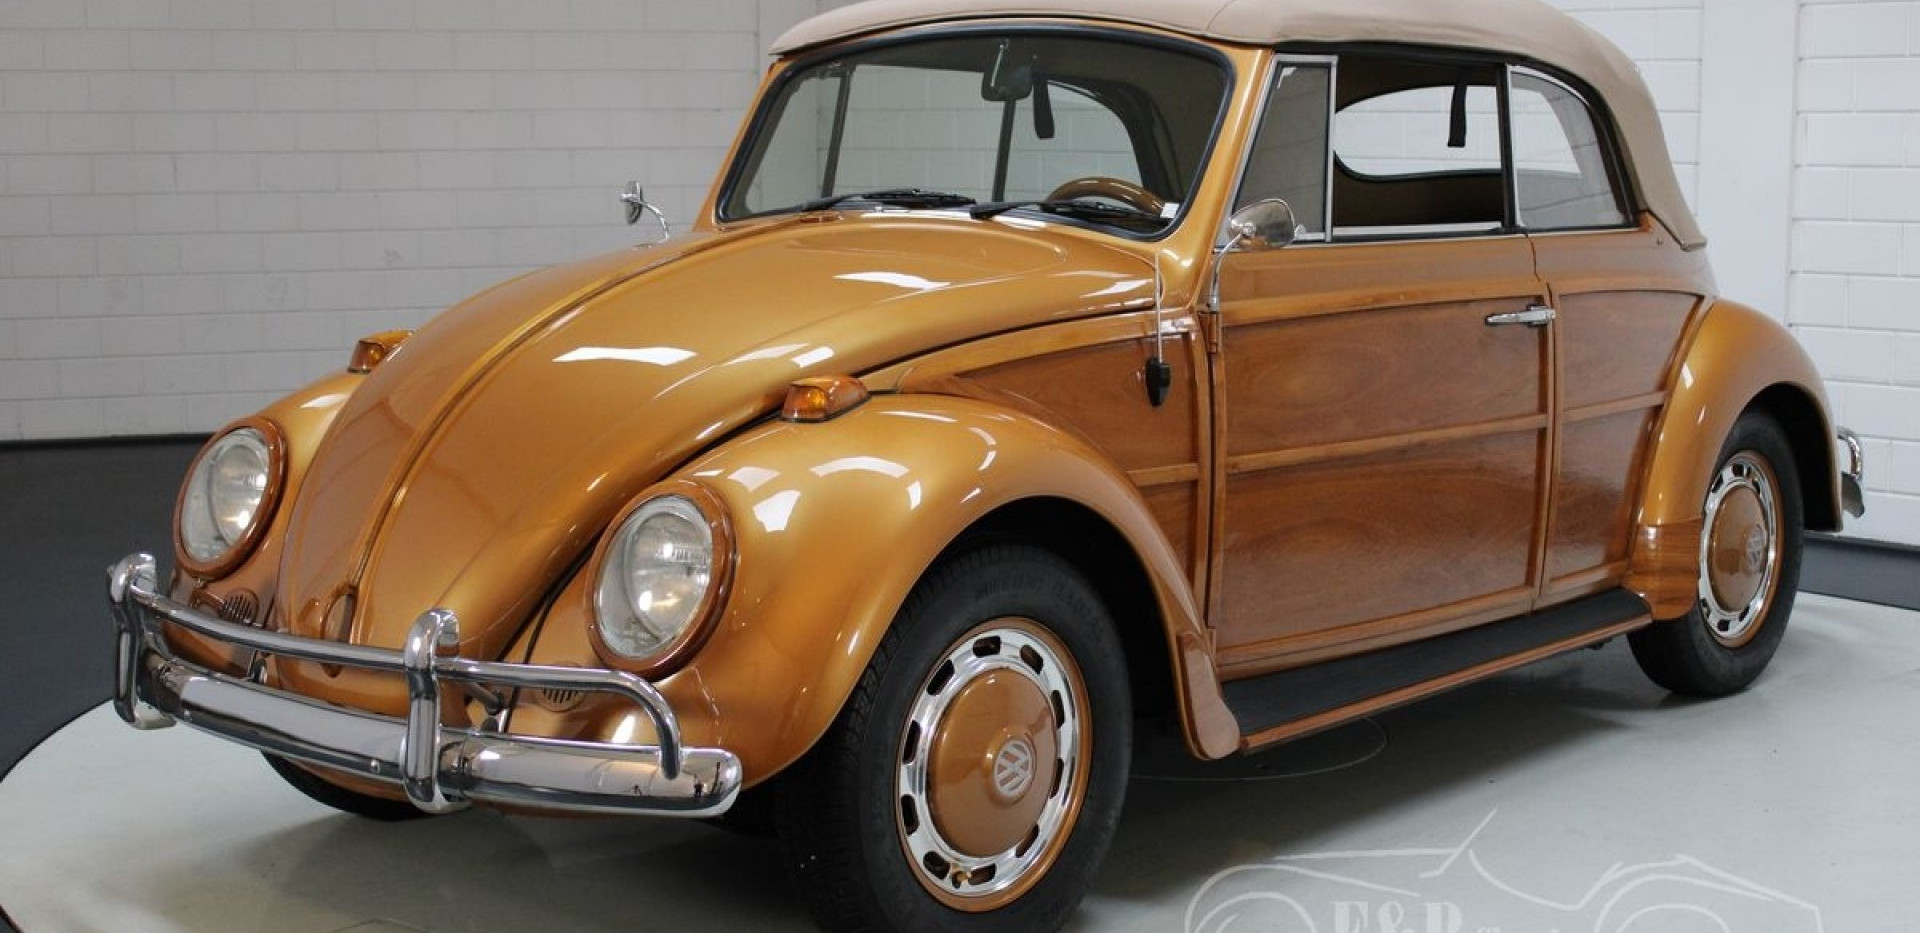 volkswagen-kever-woody-1966-v1273-056.jp